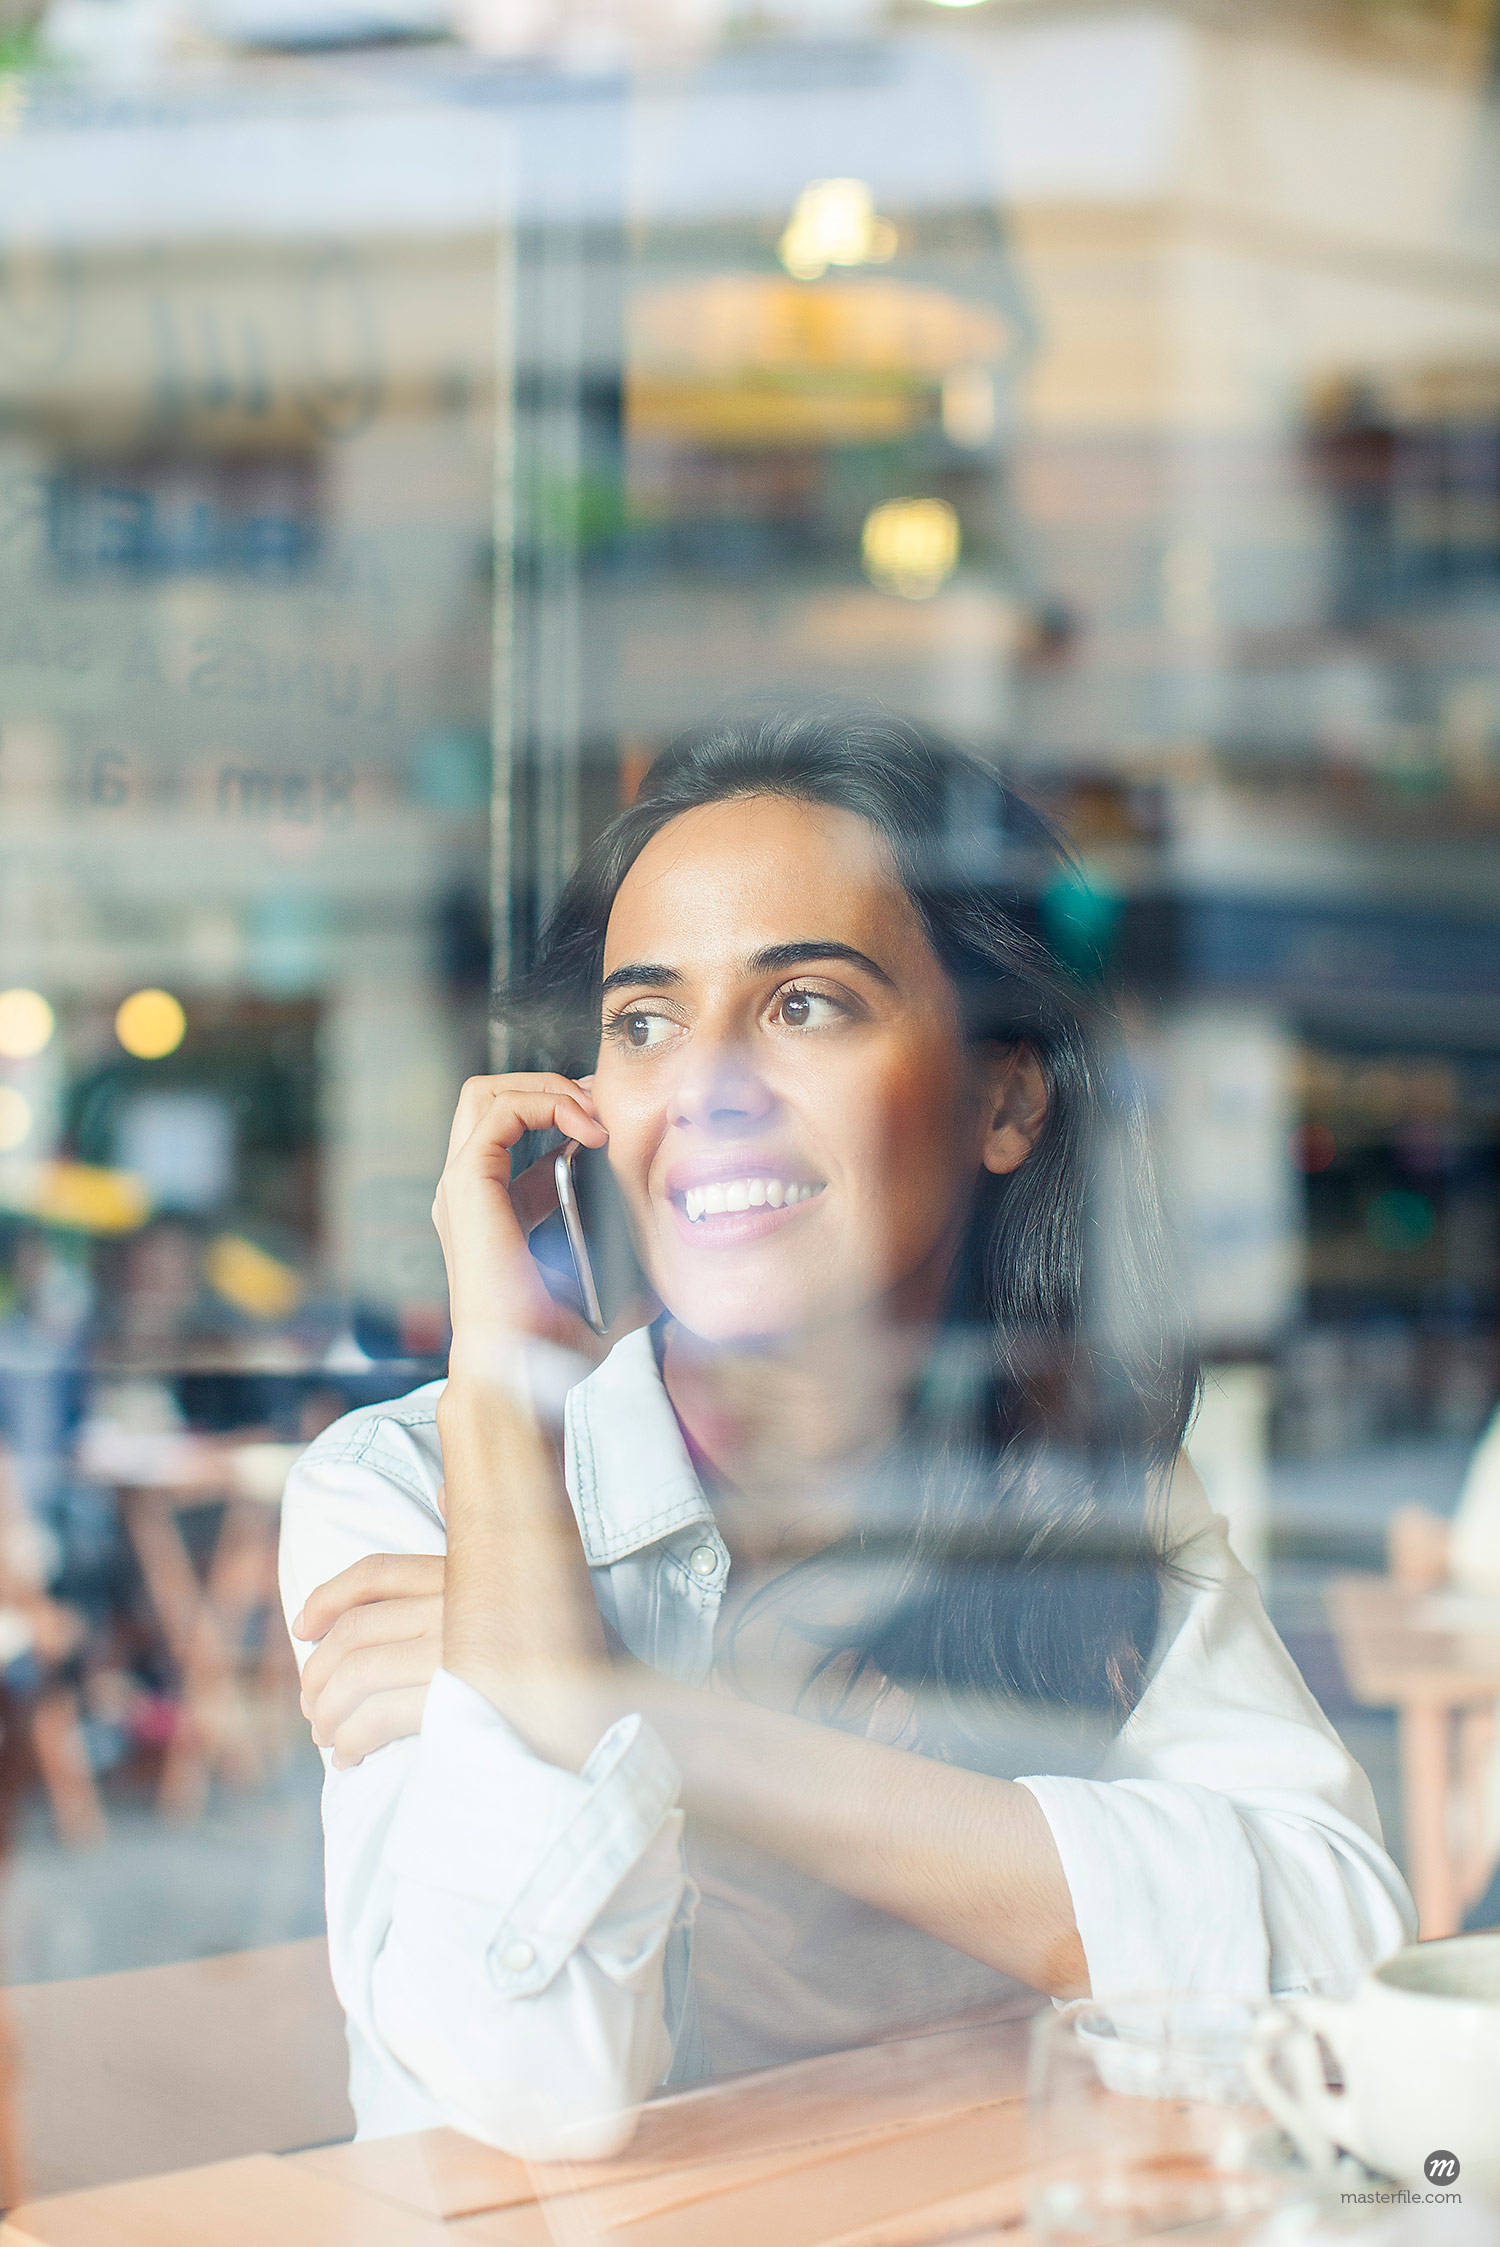 Woman in coffee shop window talking on cellphone  © Masterfile